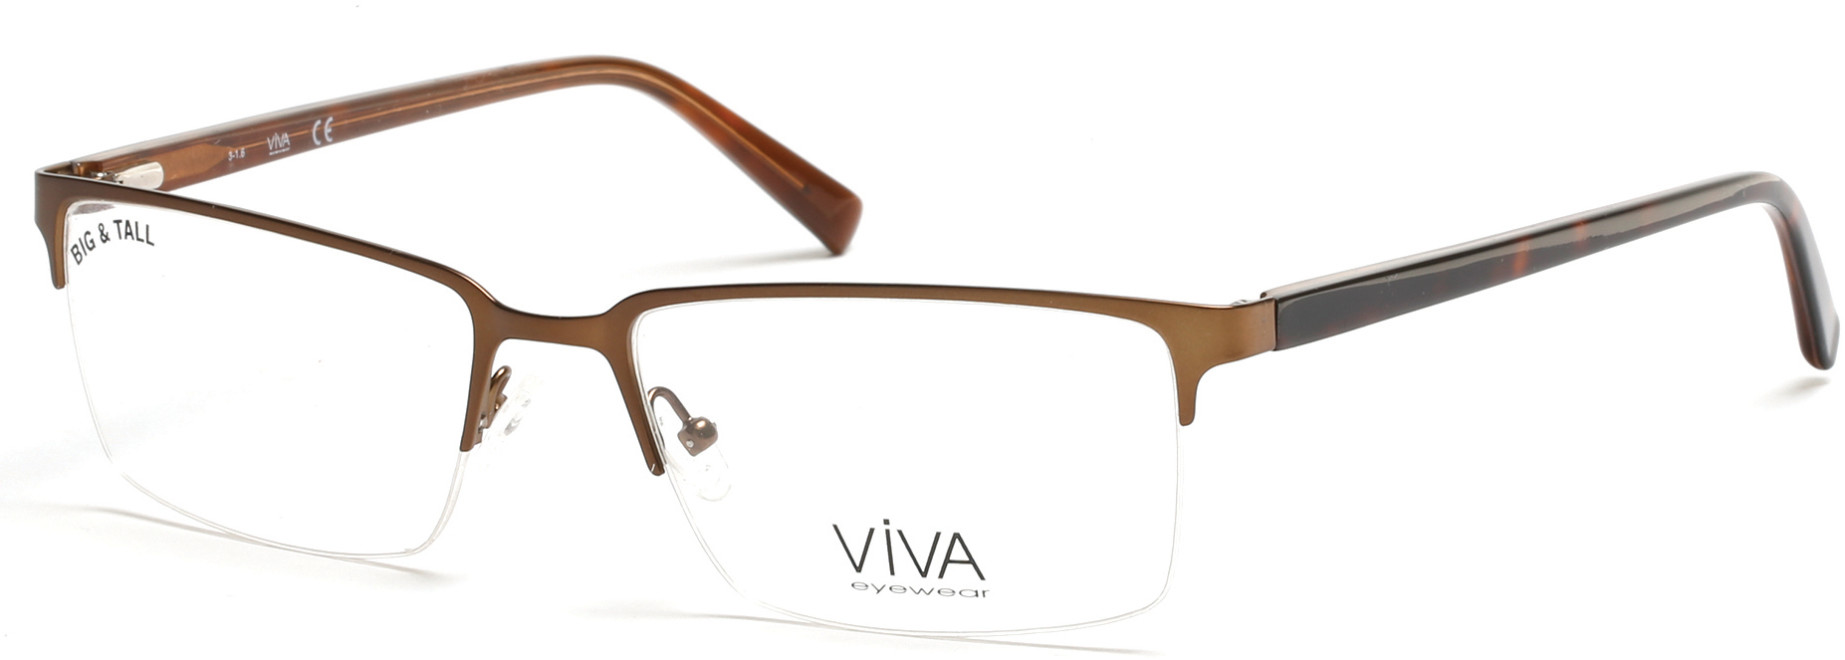 VIVA VV4025